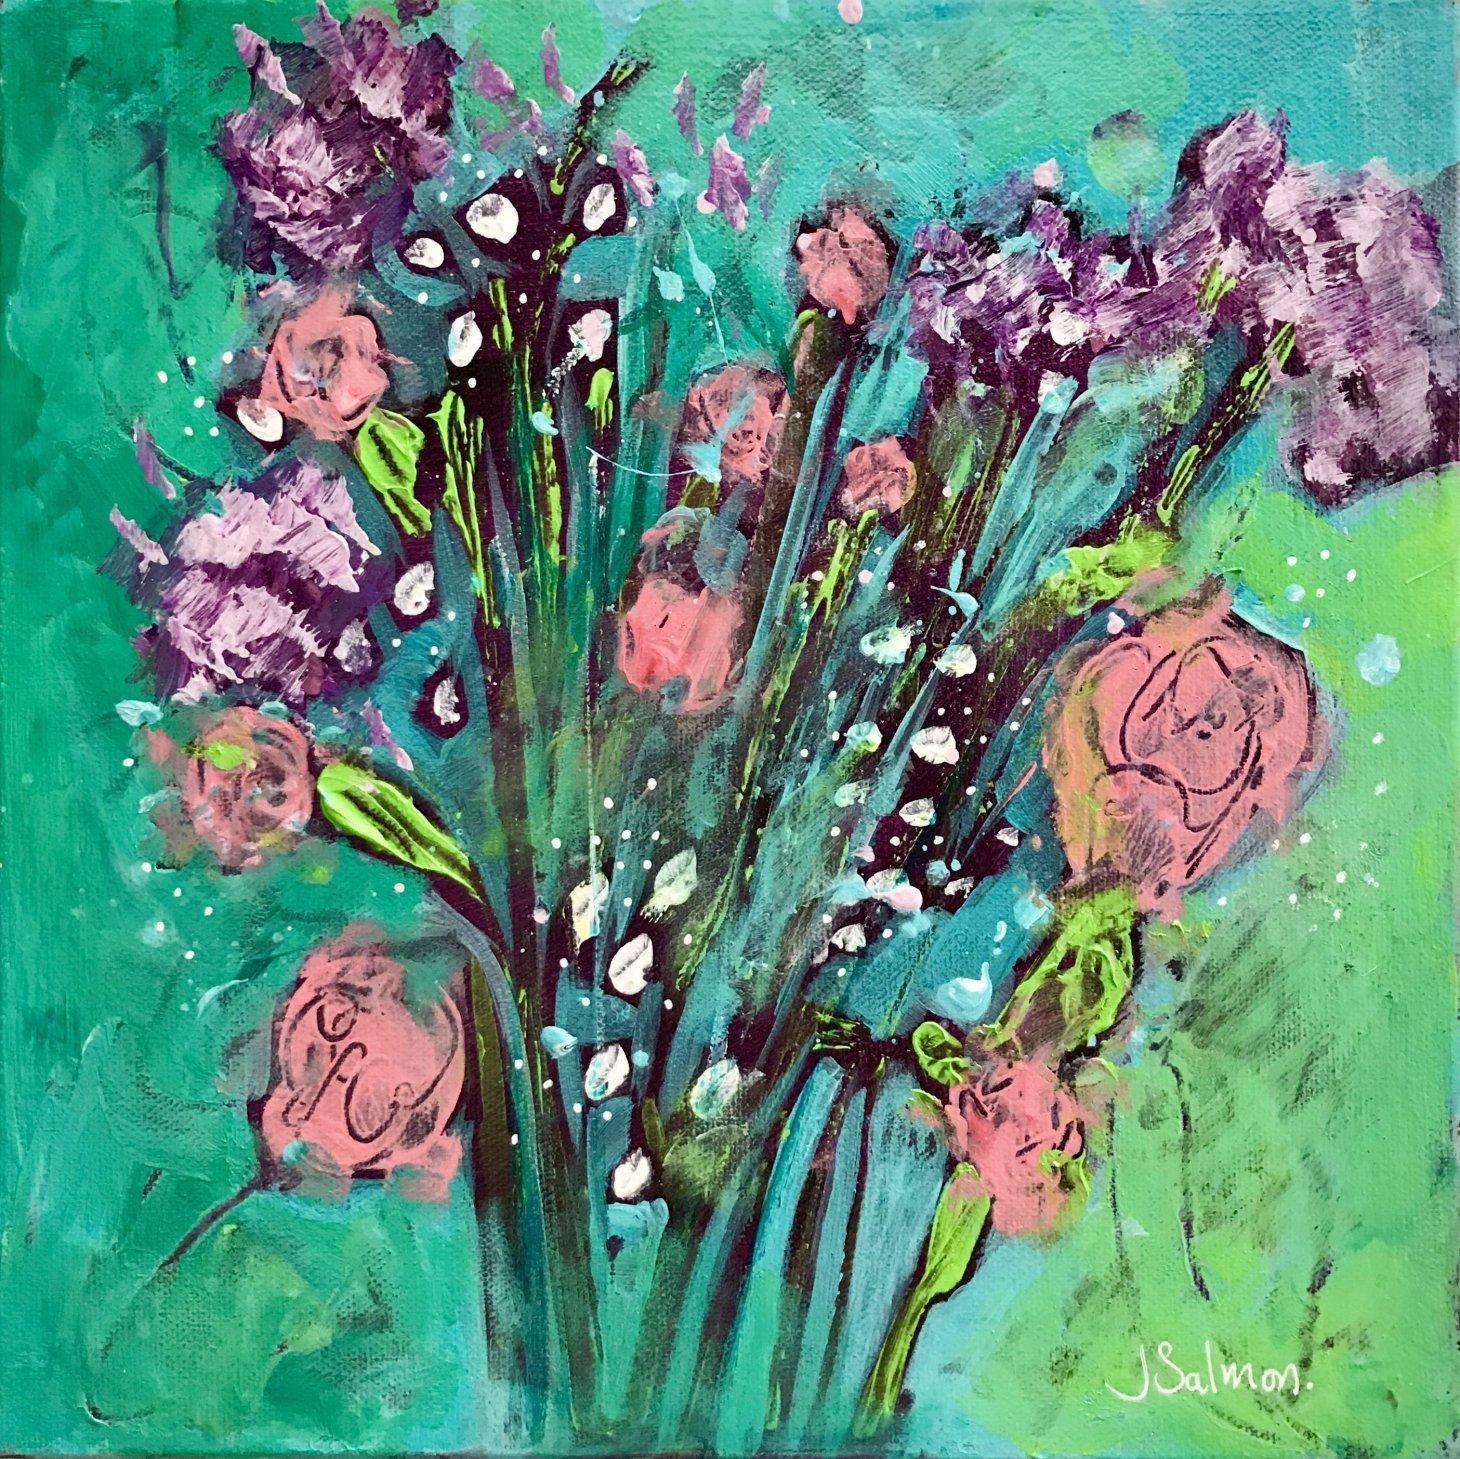 Buy Cornish Art Jo Salmon Floral Explosion 1